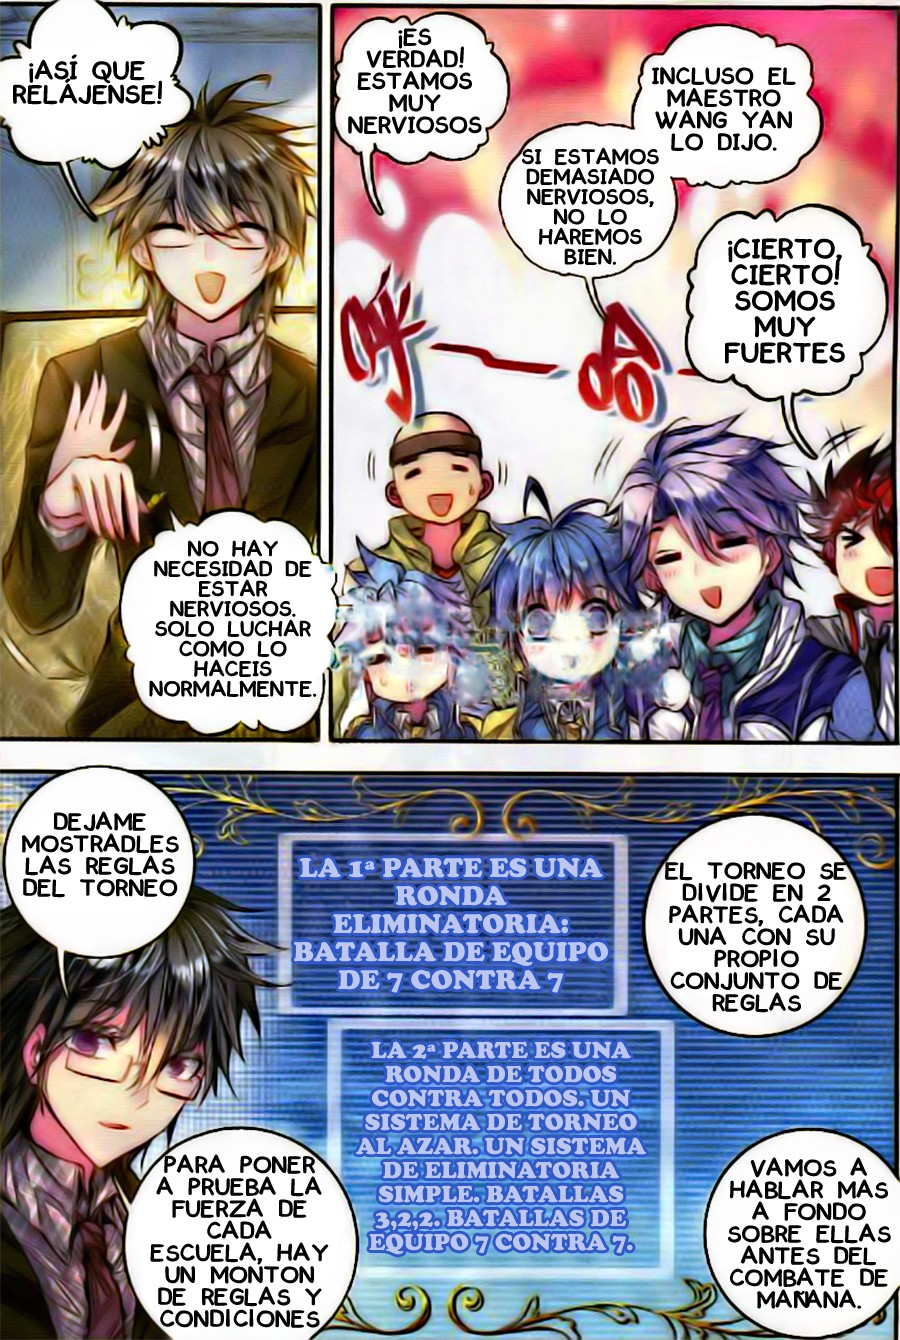 http://c5.ninemanga.com/es_manga/33/16417/439091/3533a695271296addb6e0e81d5650e38.jpg Page 7